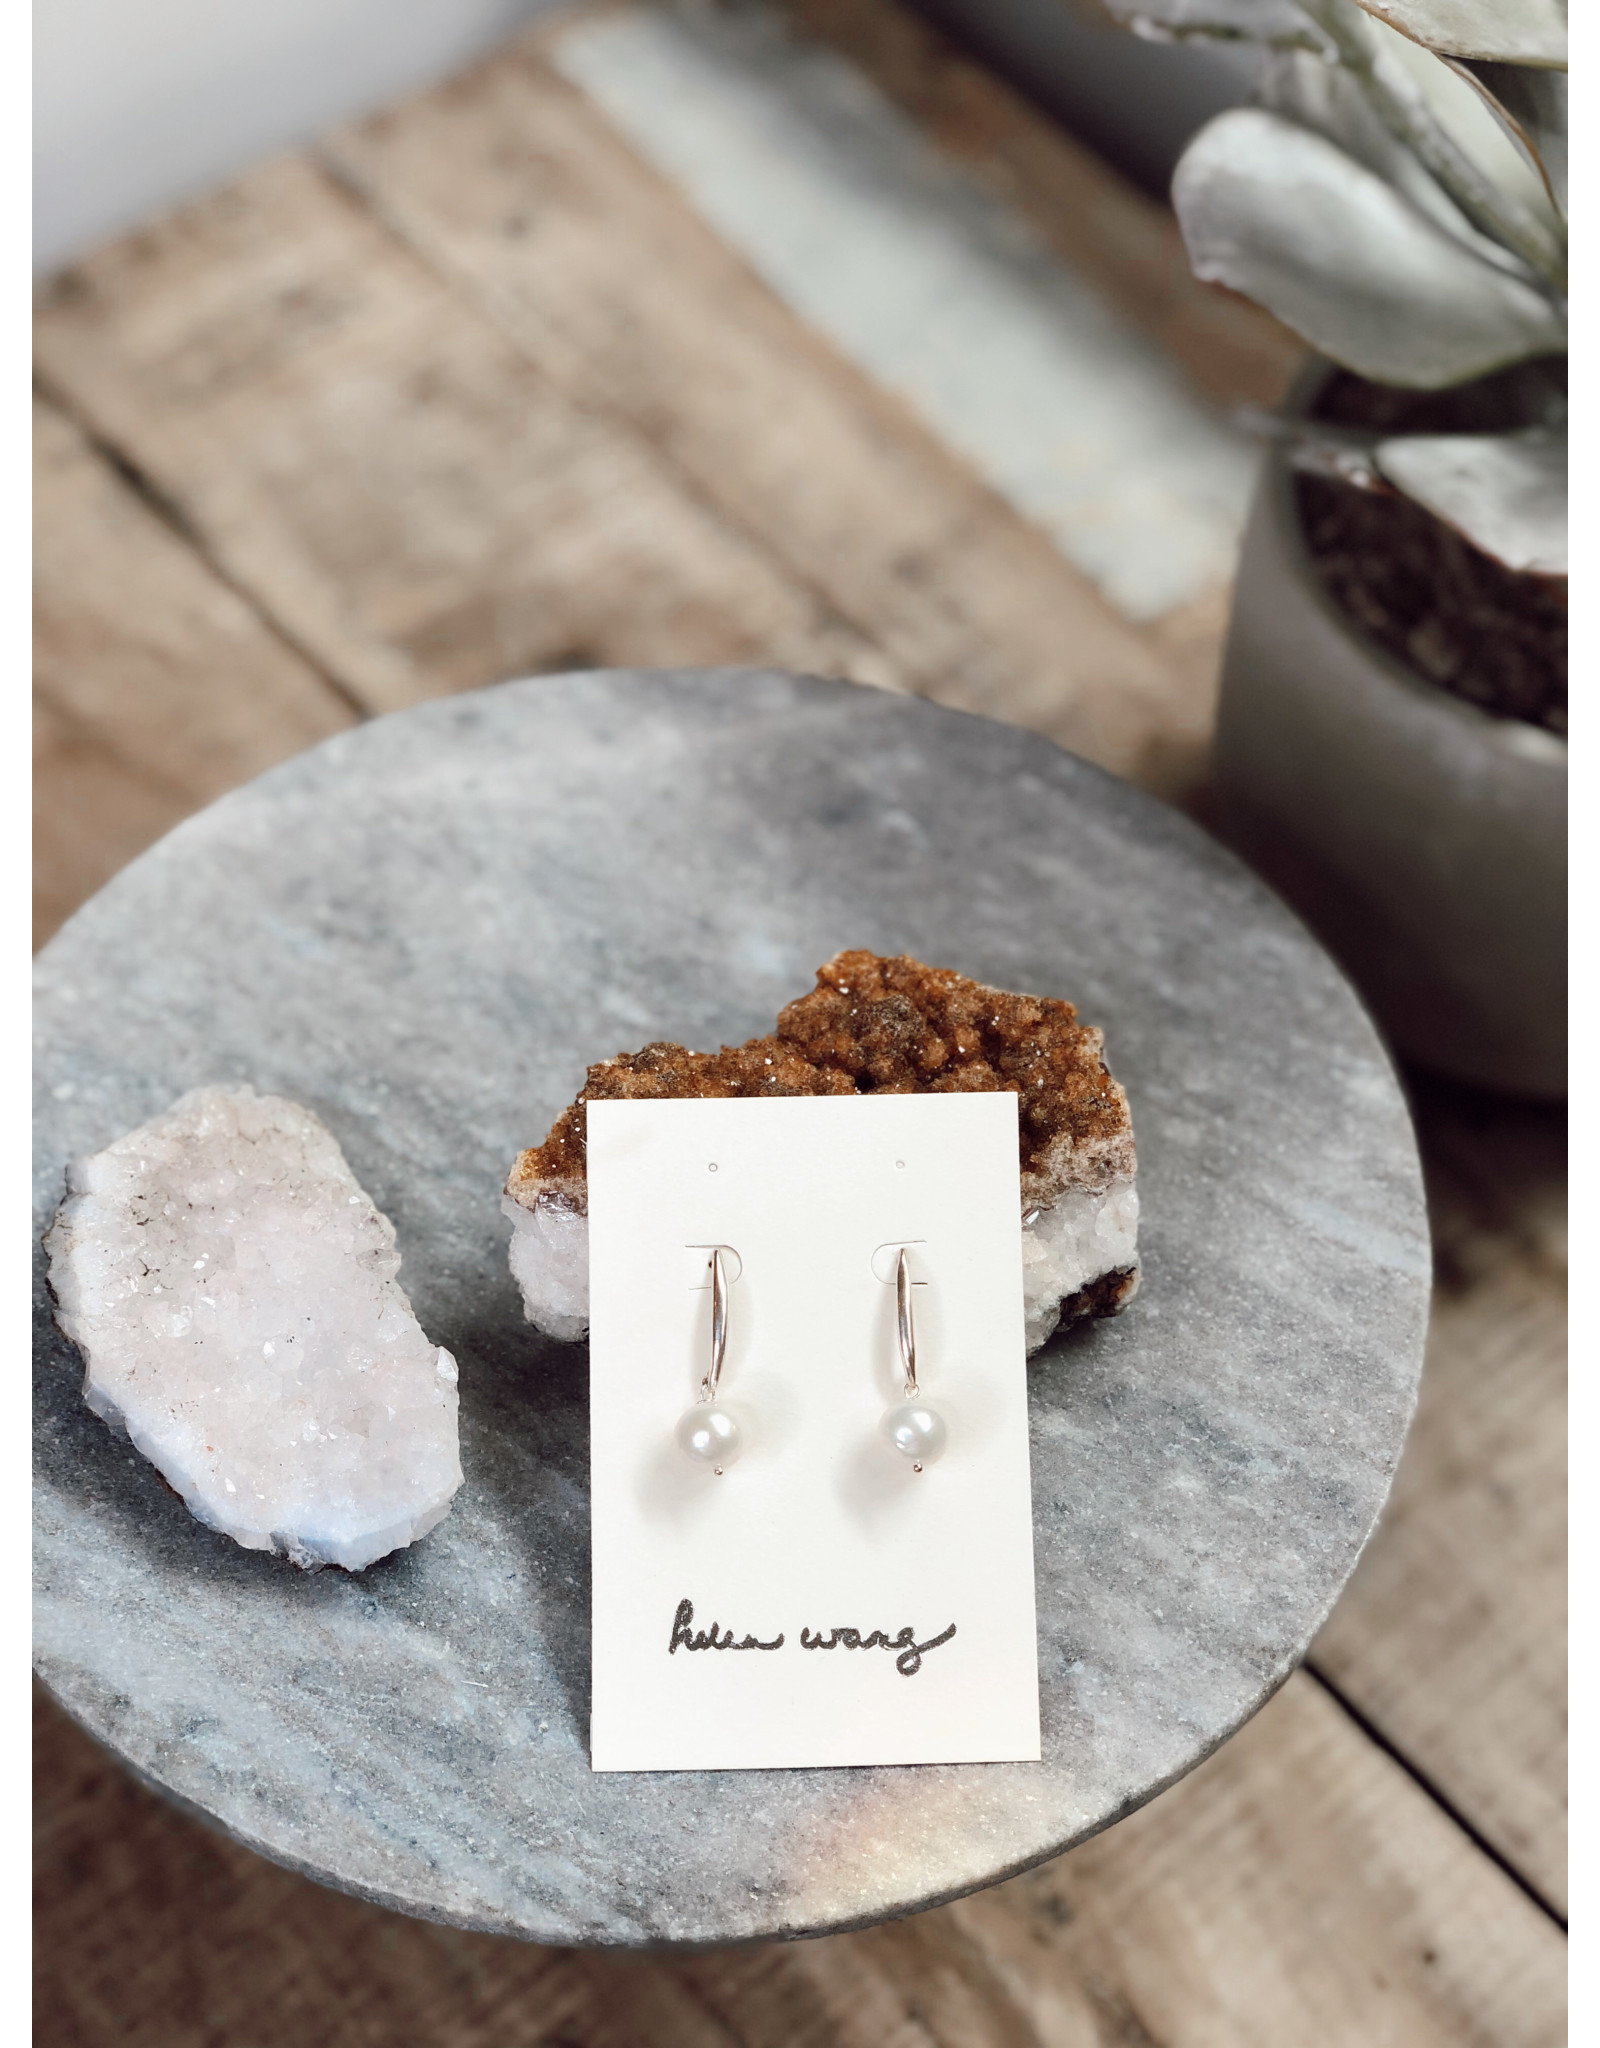 Helen Wang HW Sterling Silver A Grade Large Natural Pearl Earrings